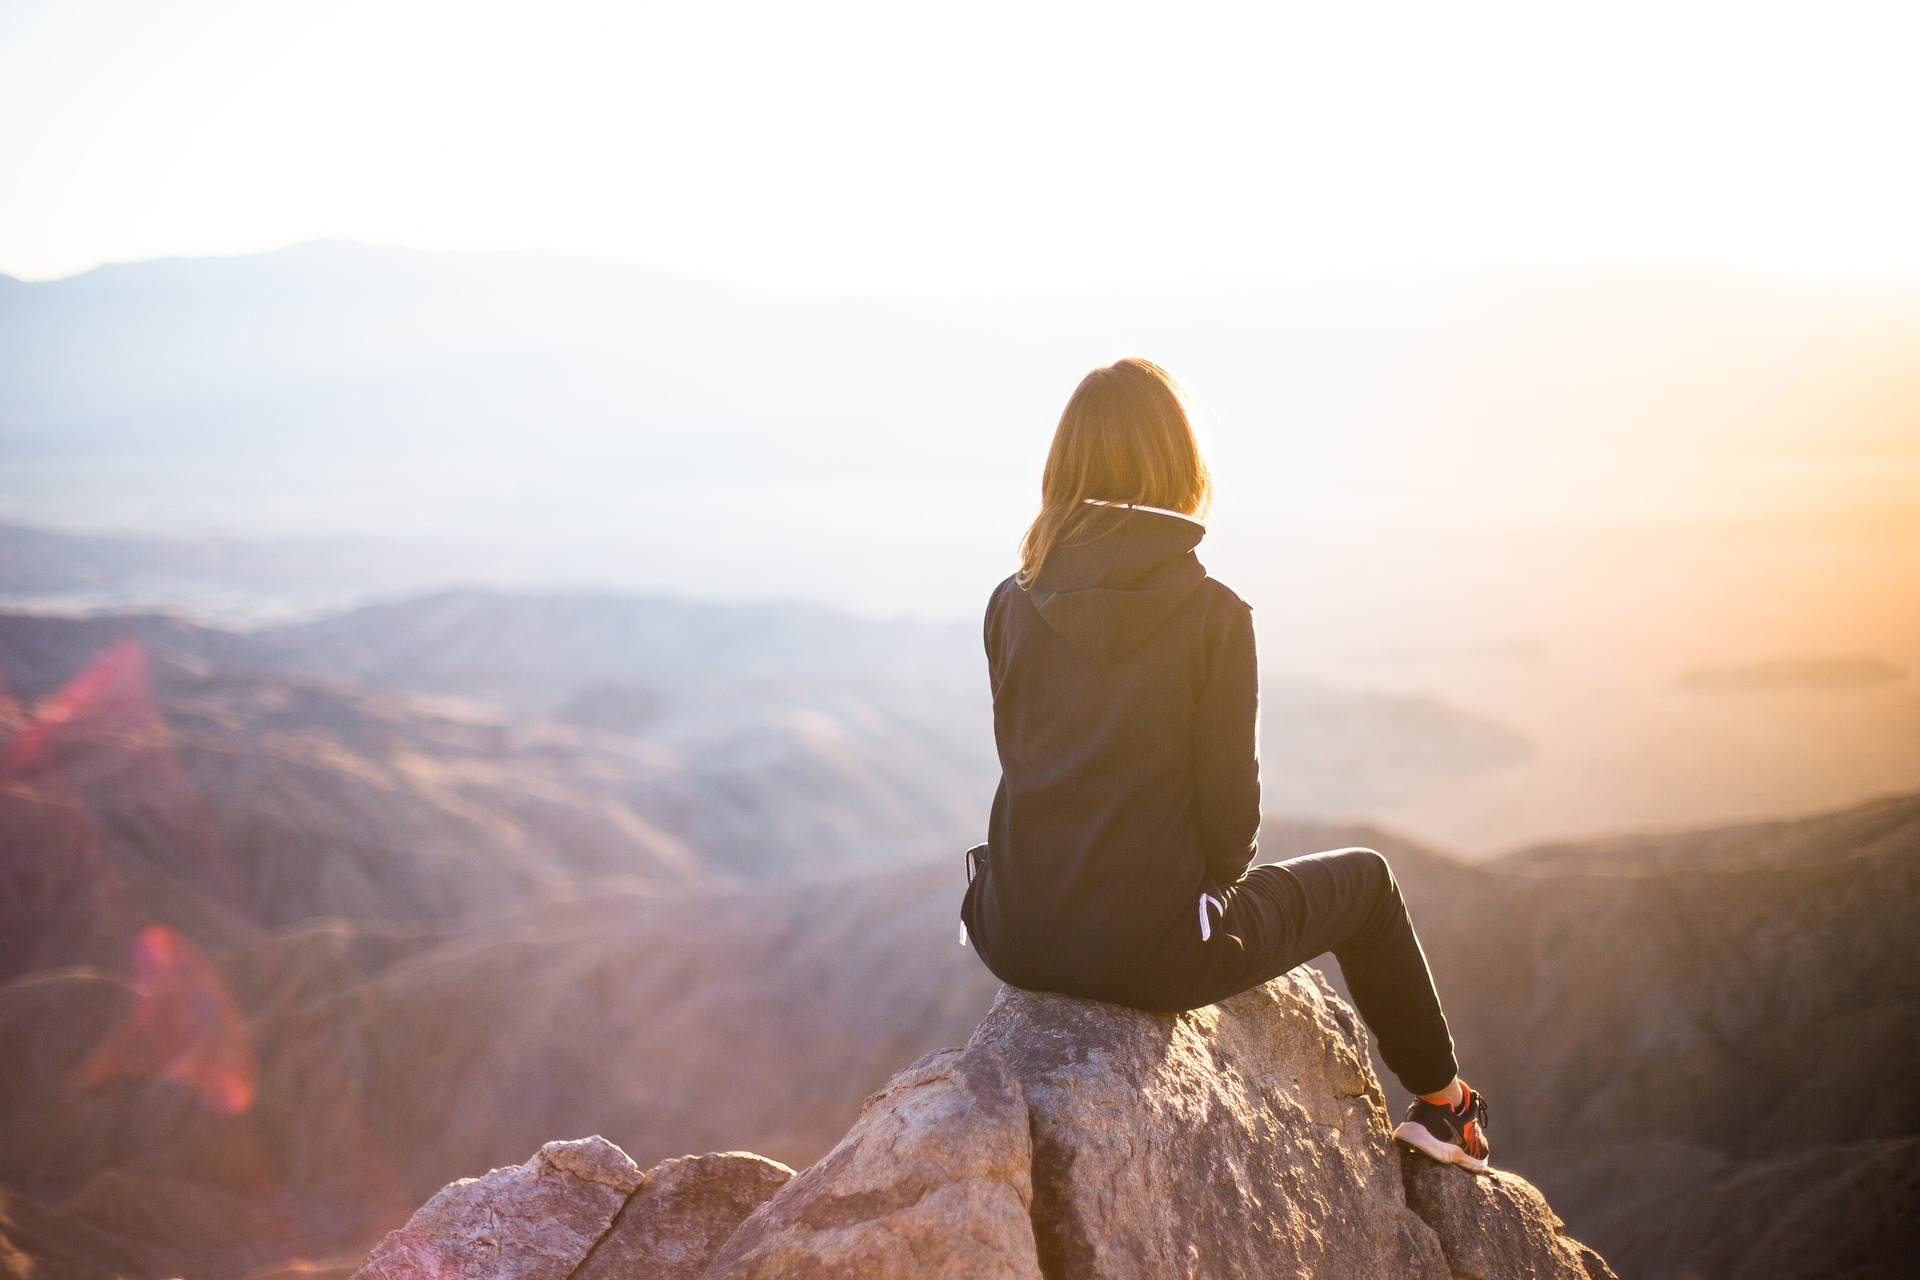 Girl on a mountain image